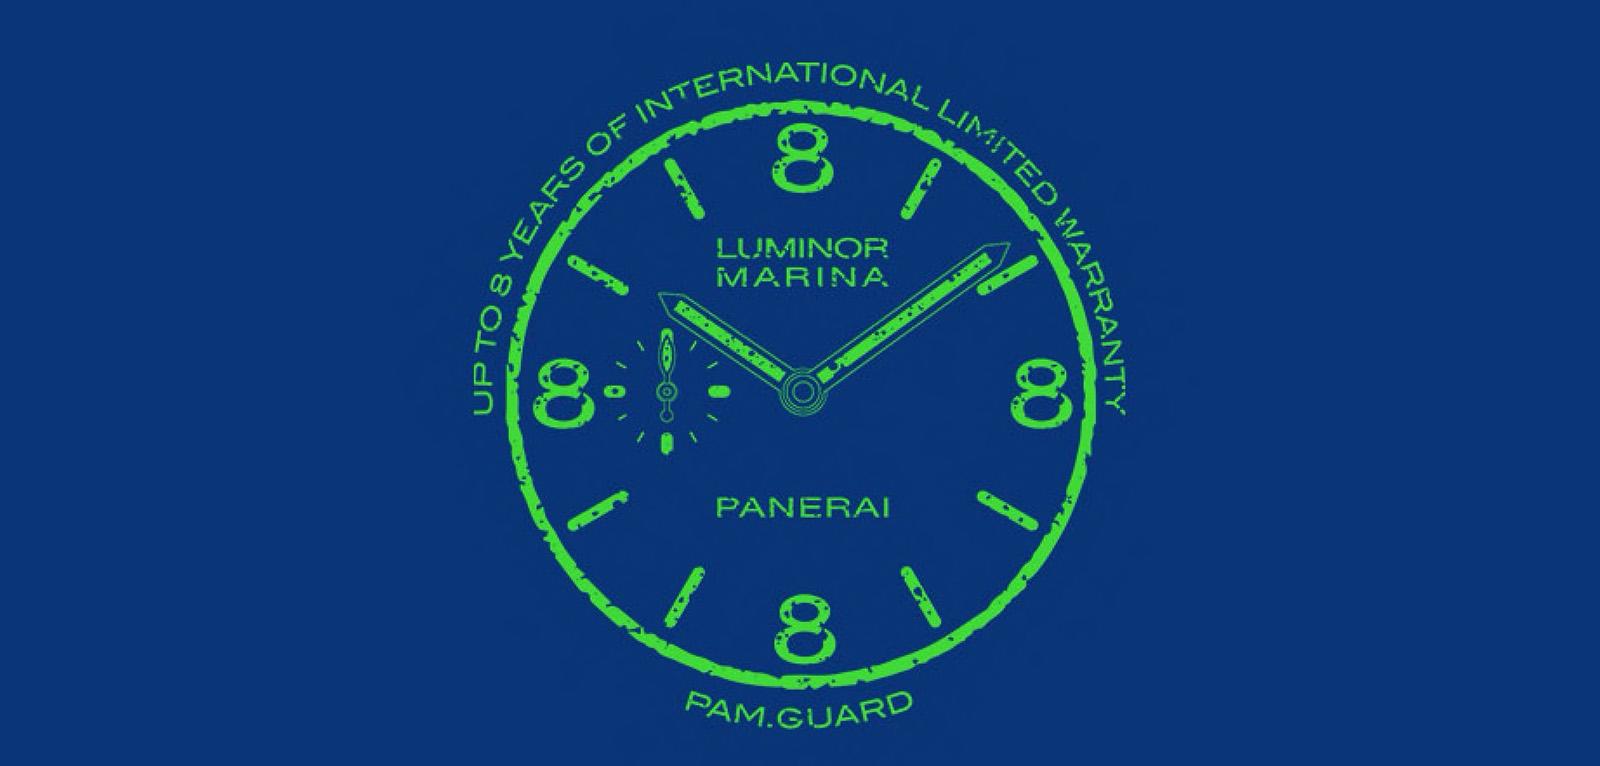 Panerai PAM.Guard